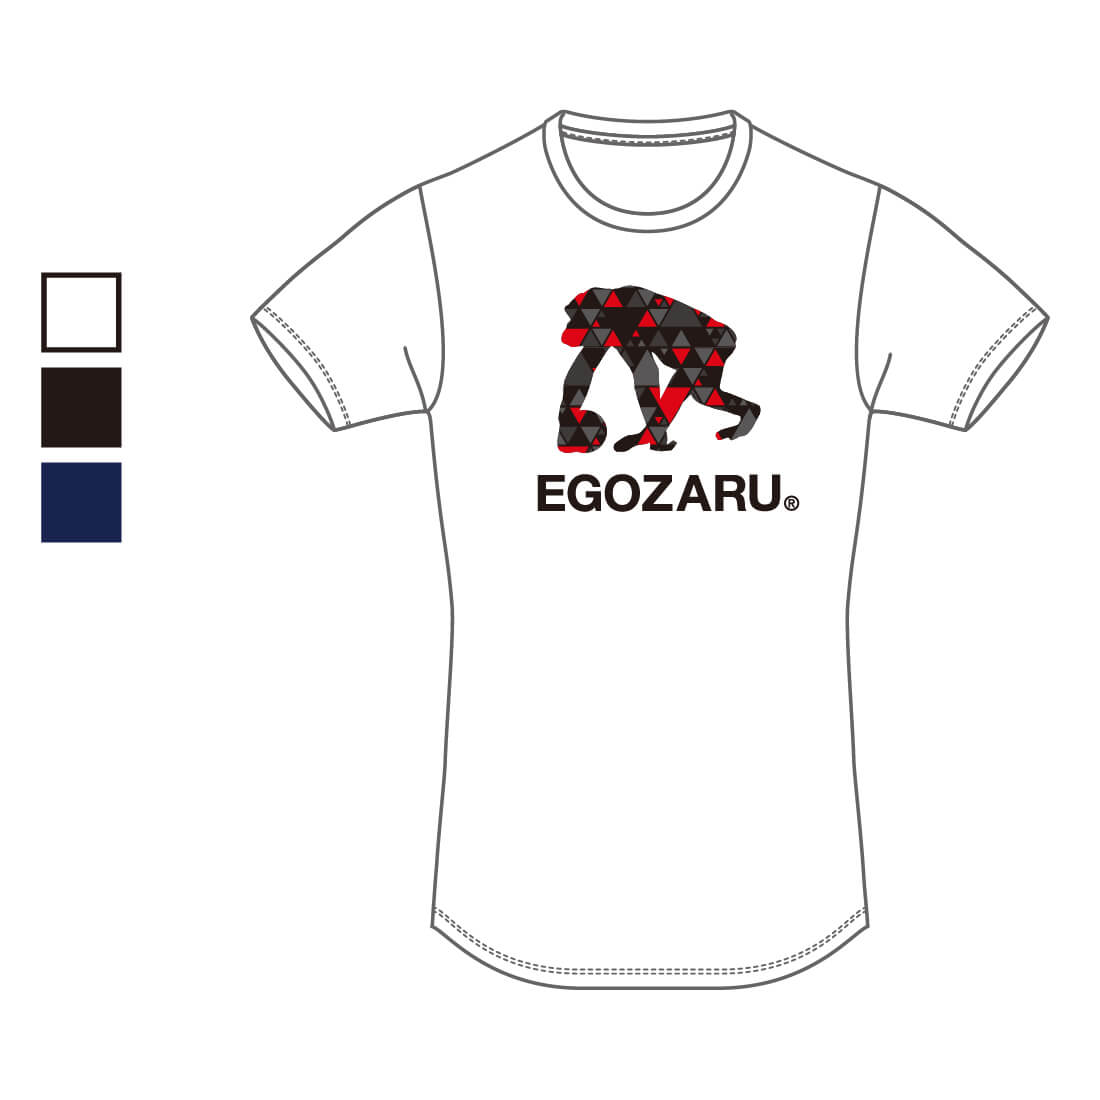 【全国U15限定】EGOZARU LOGO T-SHIRTS B